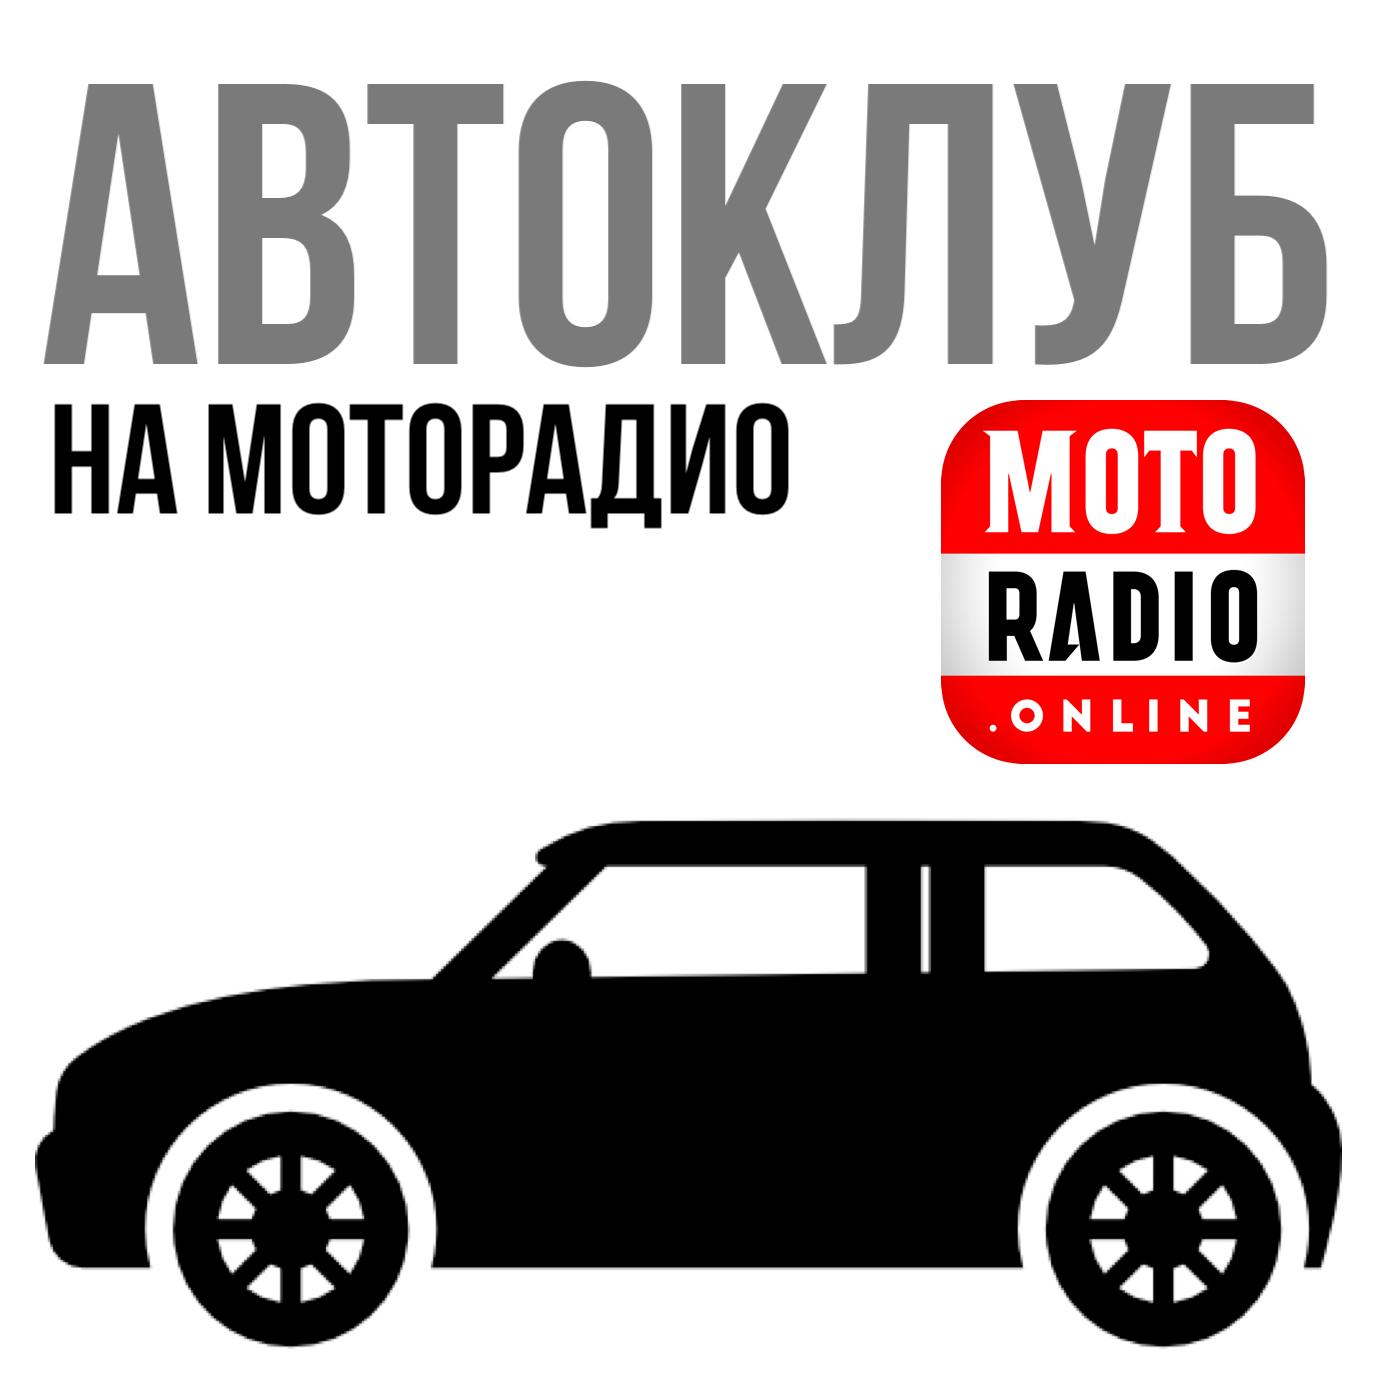 цена на Александр Цыпин Тюнинг-мастерская ВИН Кастомс в гостях на МОТОРАДИО